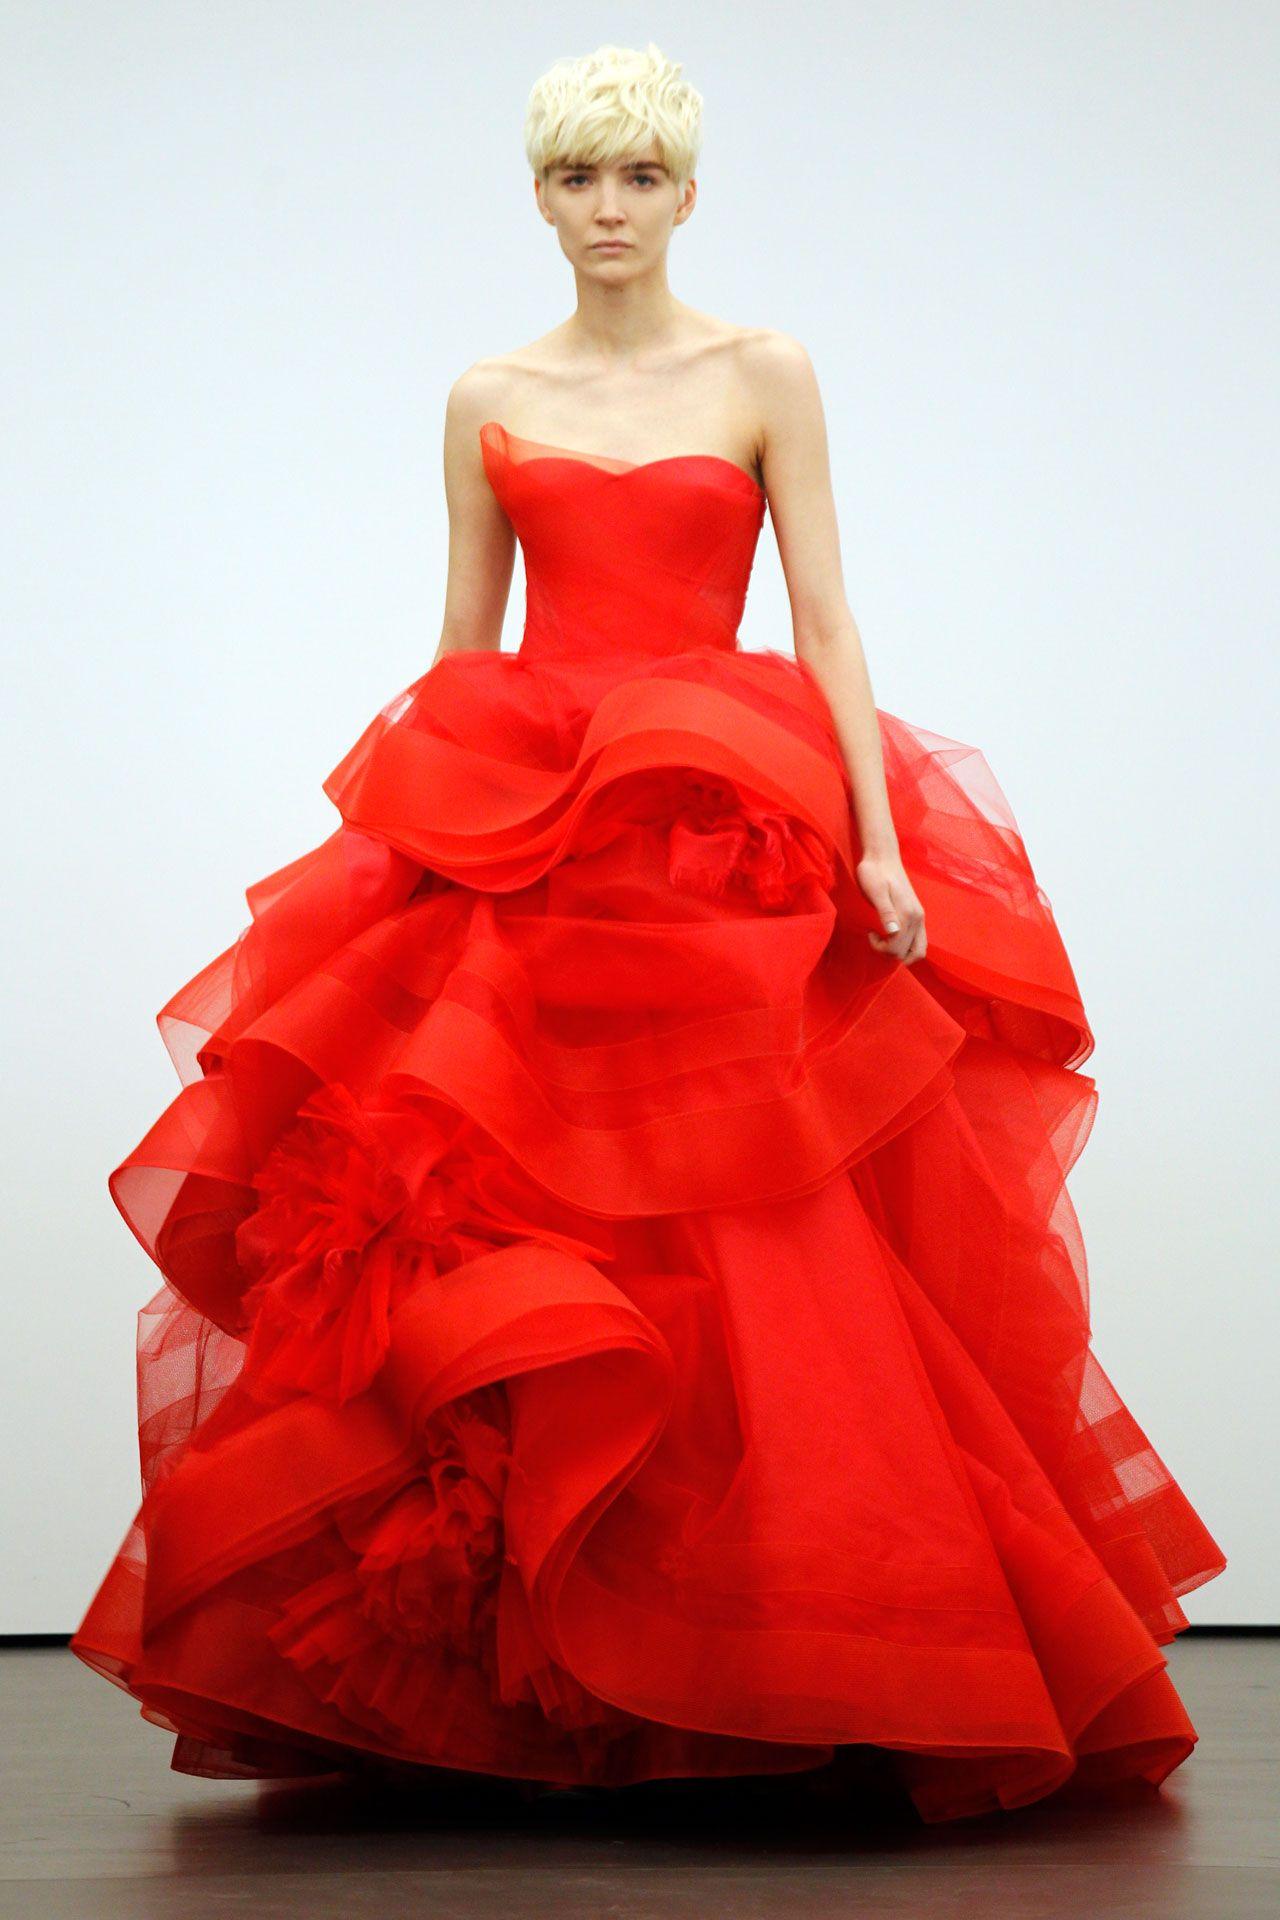 Red wedding dresses vera wang  Wedding Dresses  The Ultimate Gallery BridesMagazine  red